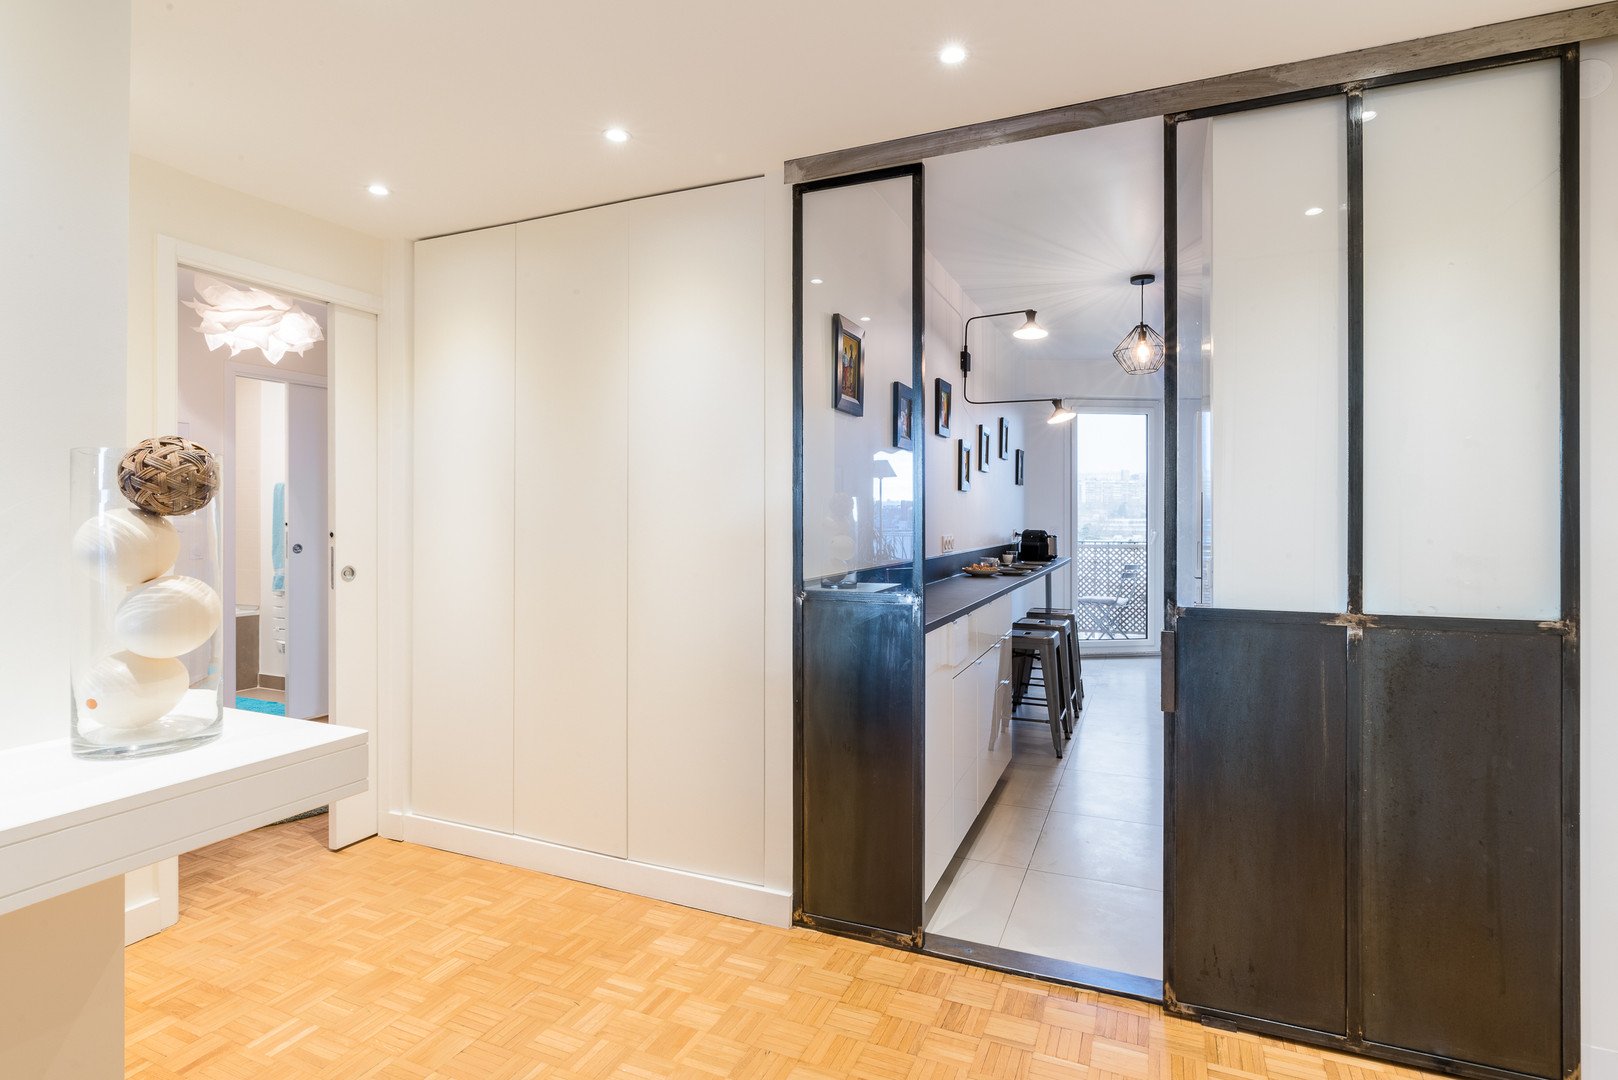 2_2017-12-14-Appartement Boulogne-13.jpg